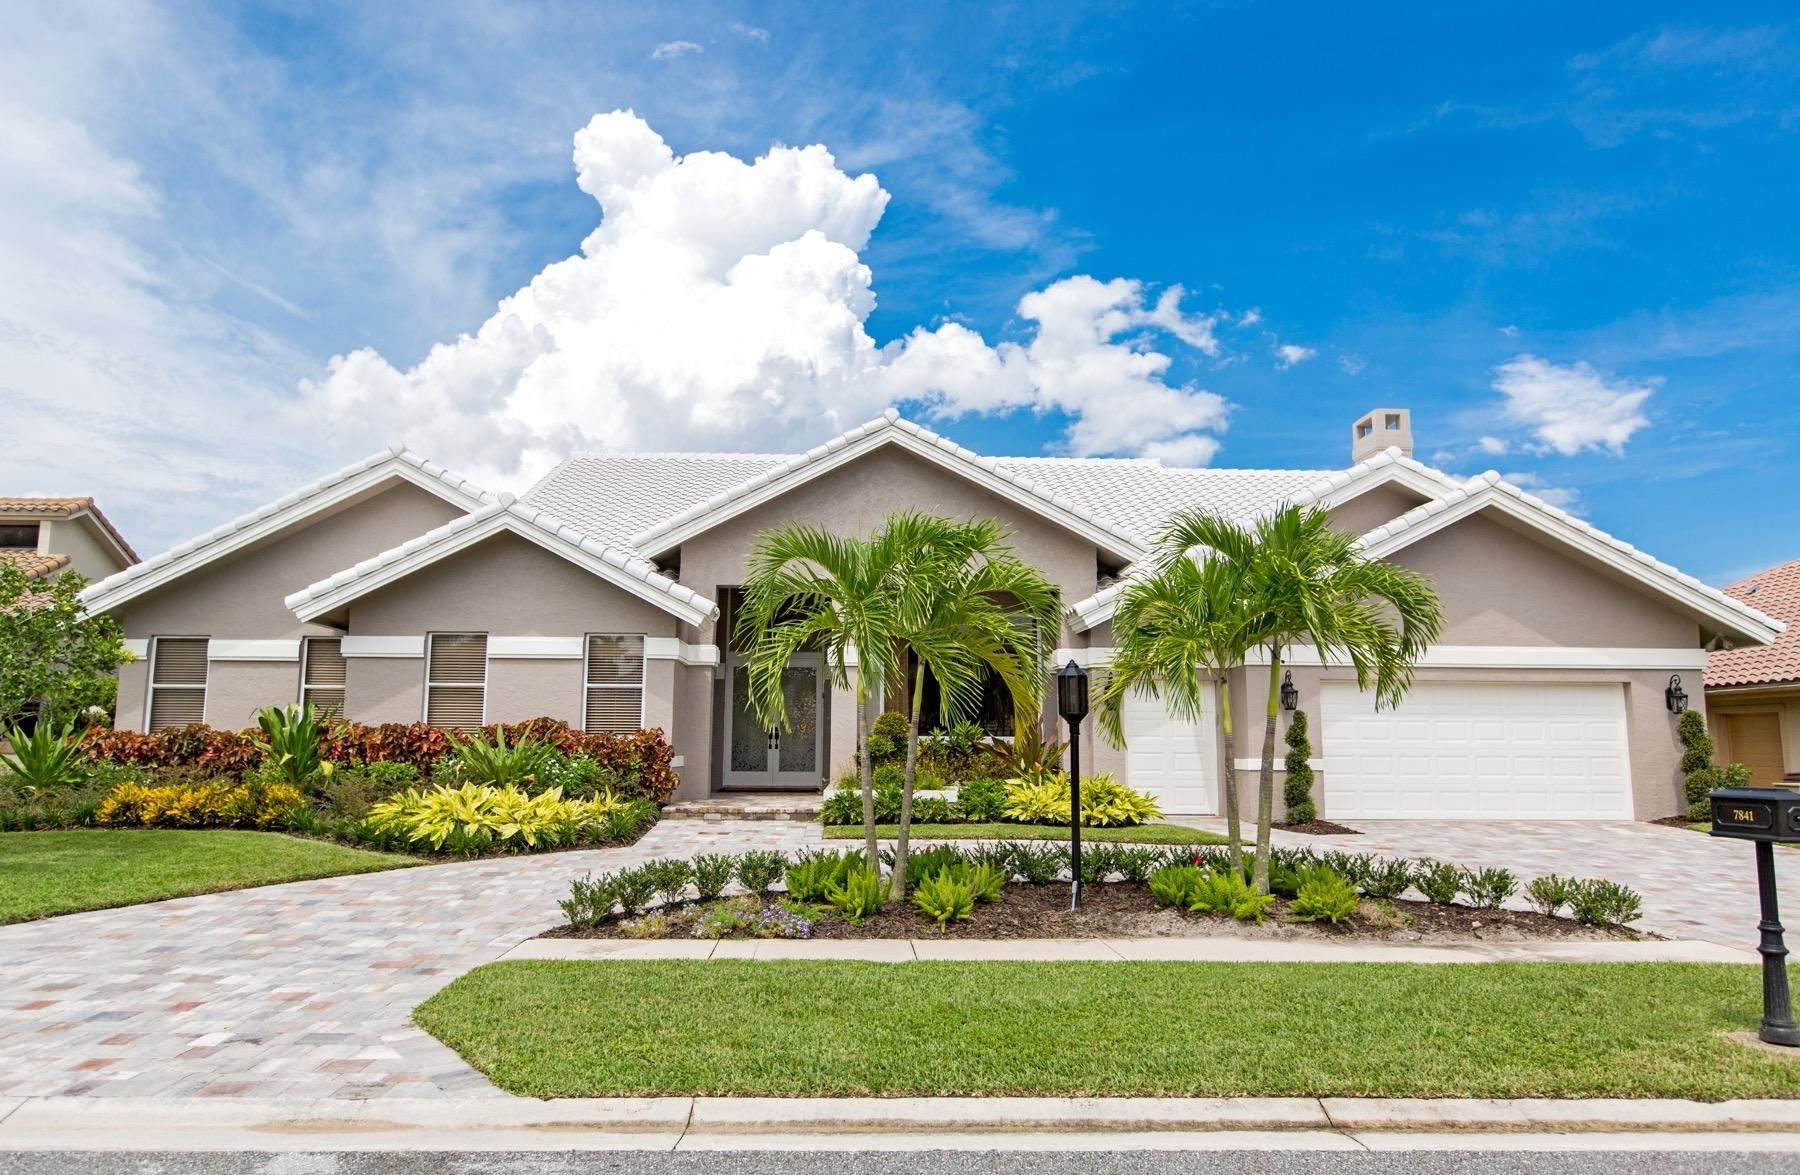 Photo of 7841 Afton Villa Court, Boca Raton, FL 33433 (MLS # RX-10652180)